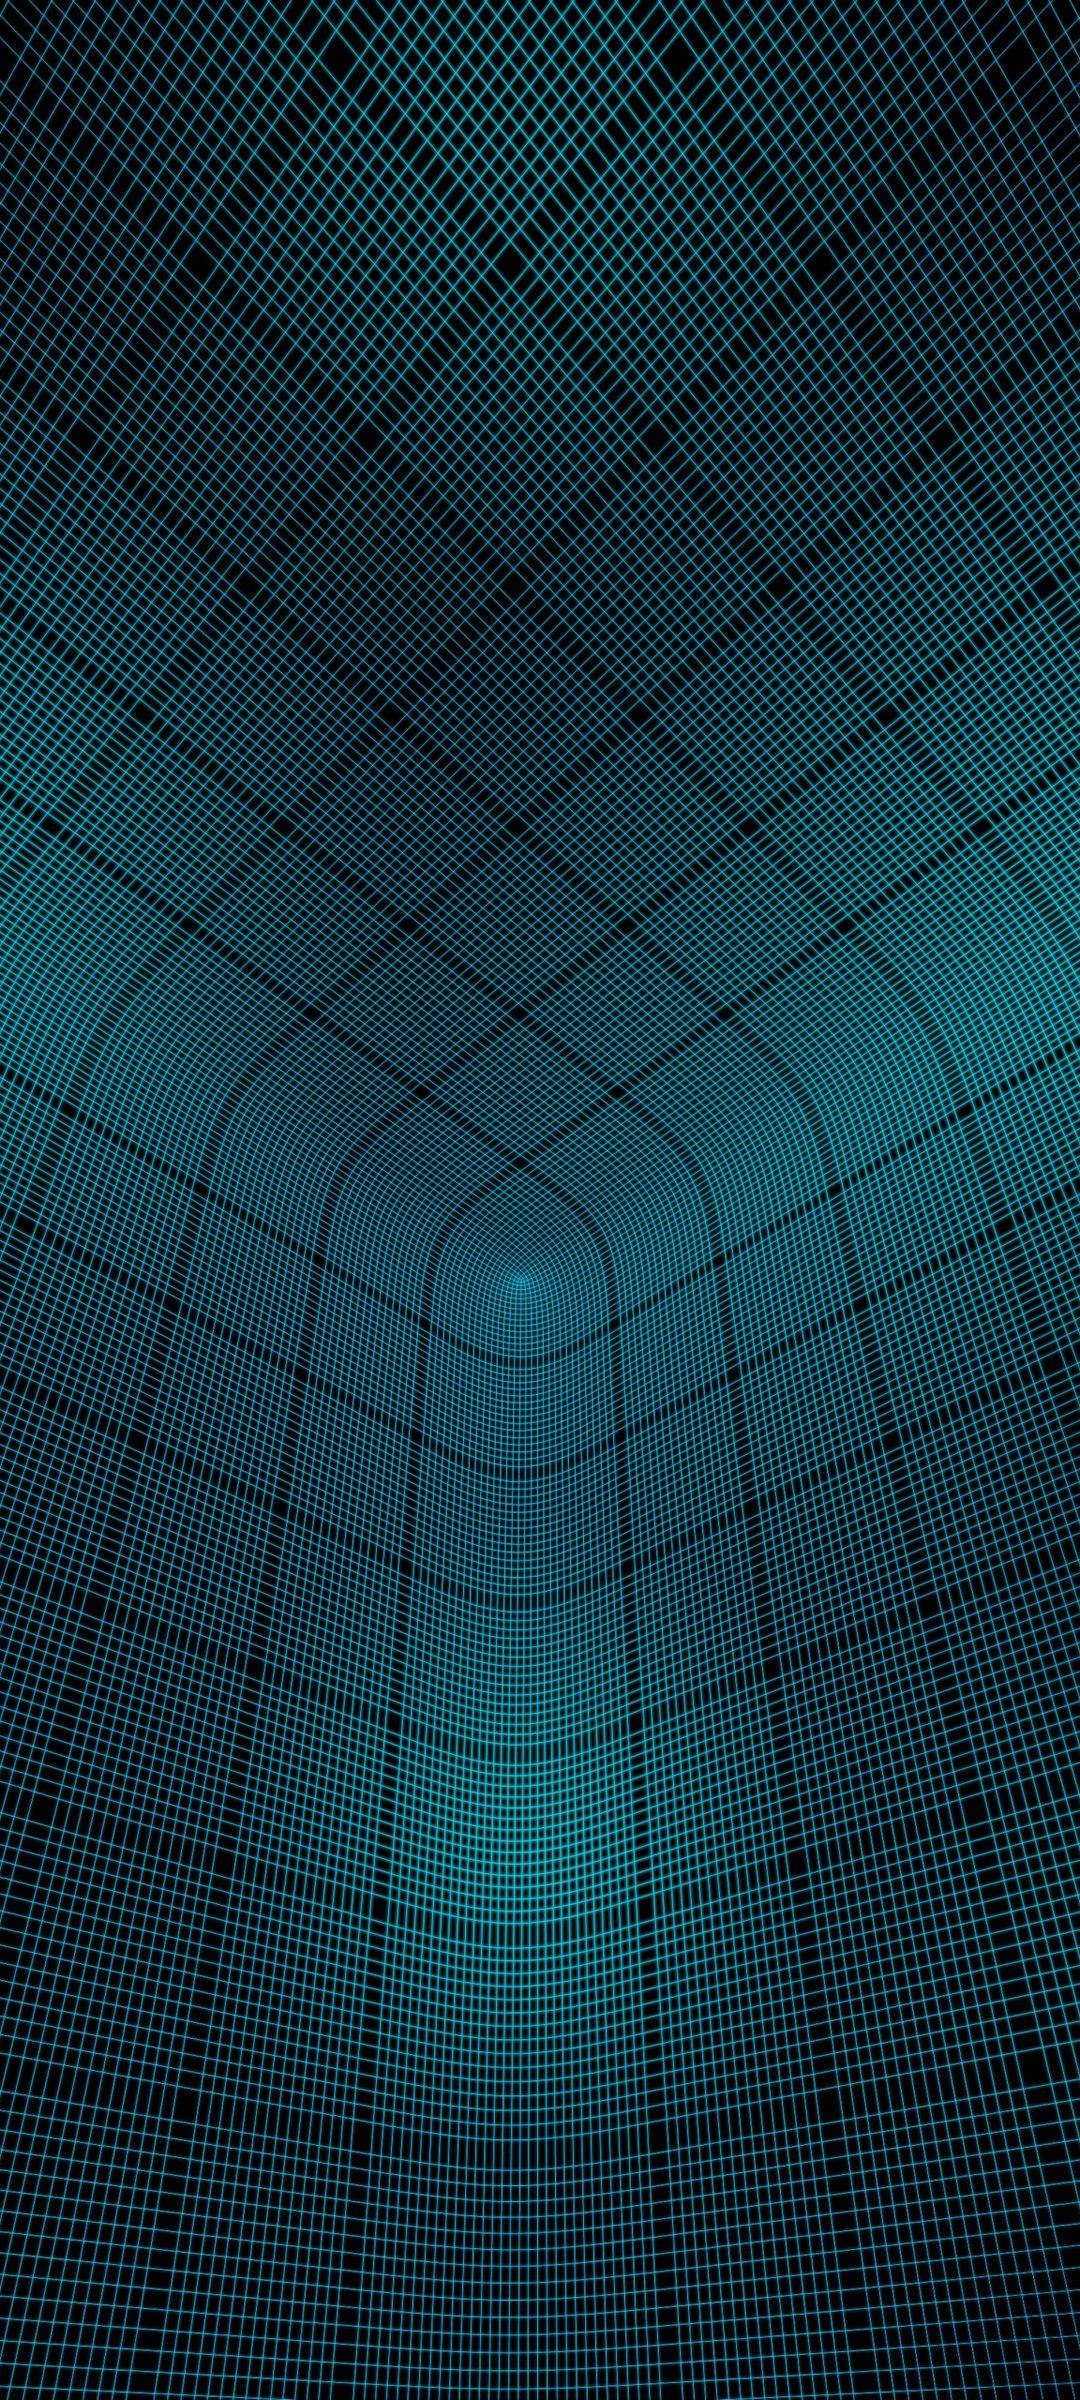 mesh optical illusion illusion